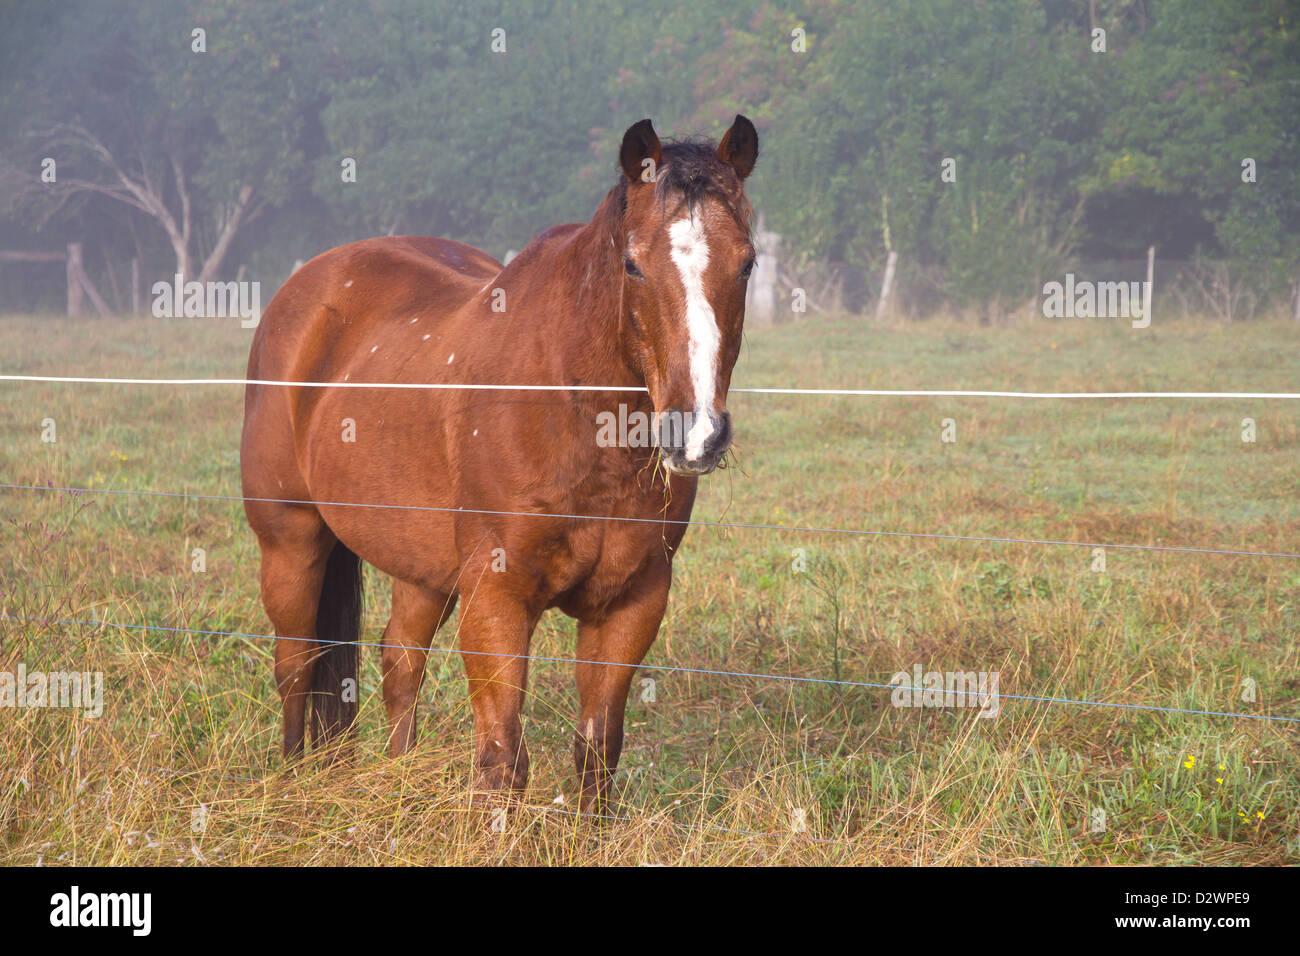 A chestnut horse Stock Photo, Royalty Free Image: 53426865 ... - photo#26